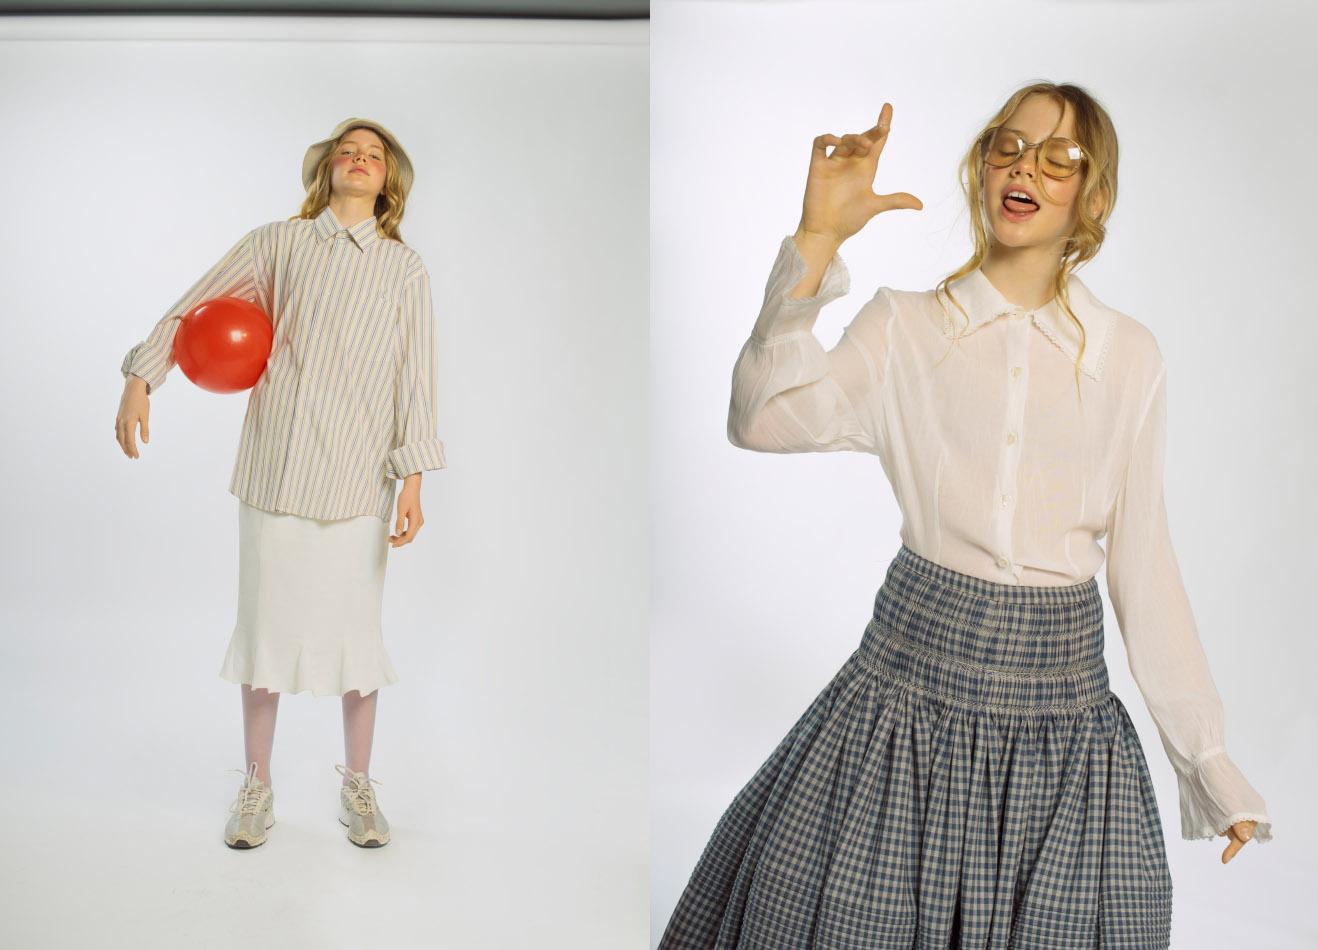 shirt  RALPH LAUREN  hat skirt and sneakers  STYLIST ' S OWN . skirt  MANEMANE  shirt  STYLIST ' S OWN  sneakers  STYLIST ' S OWN